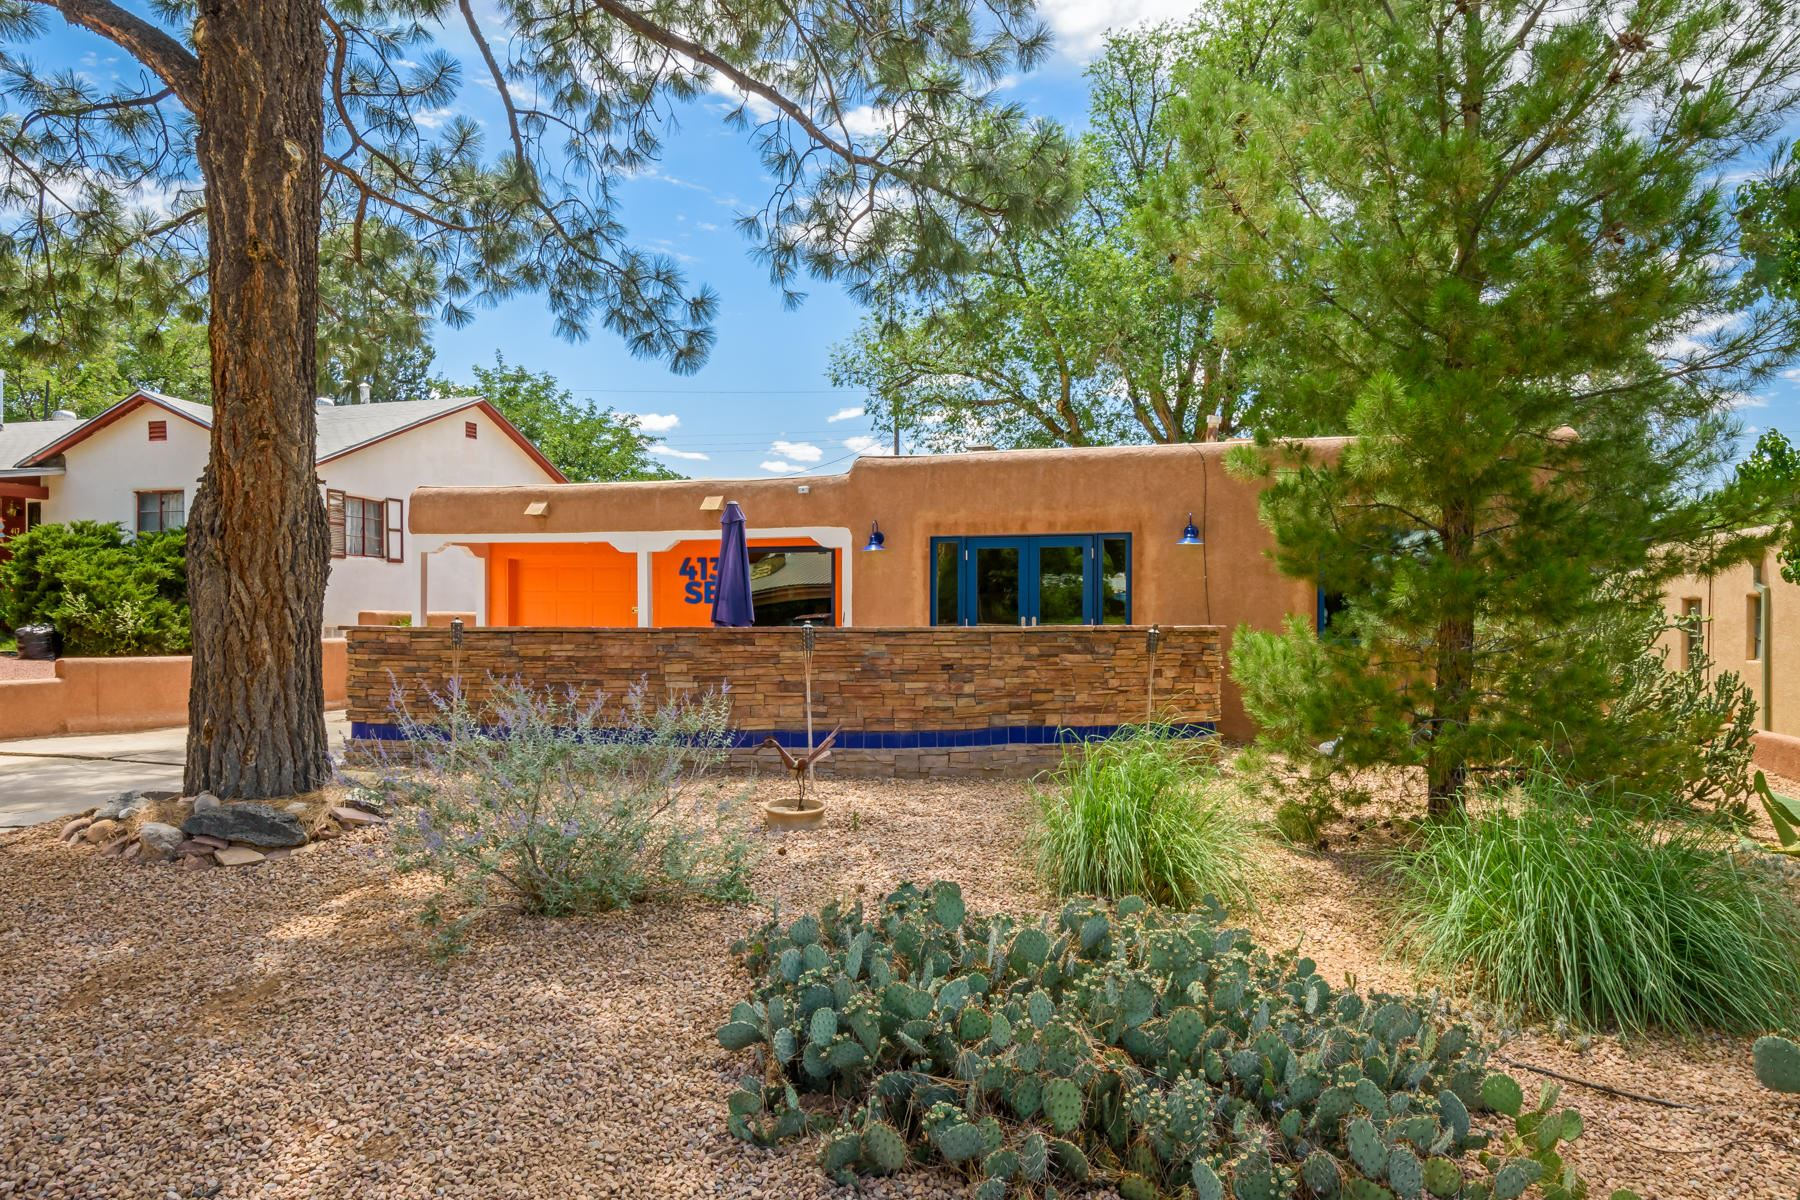 Photo of 413 MONTCLAIRE Drive SE, Albuquerque, NM 87108 (MLS # 971575)